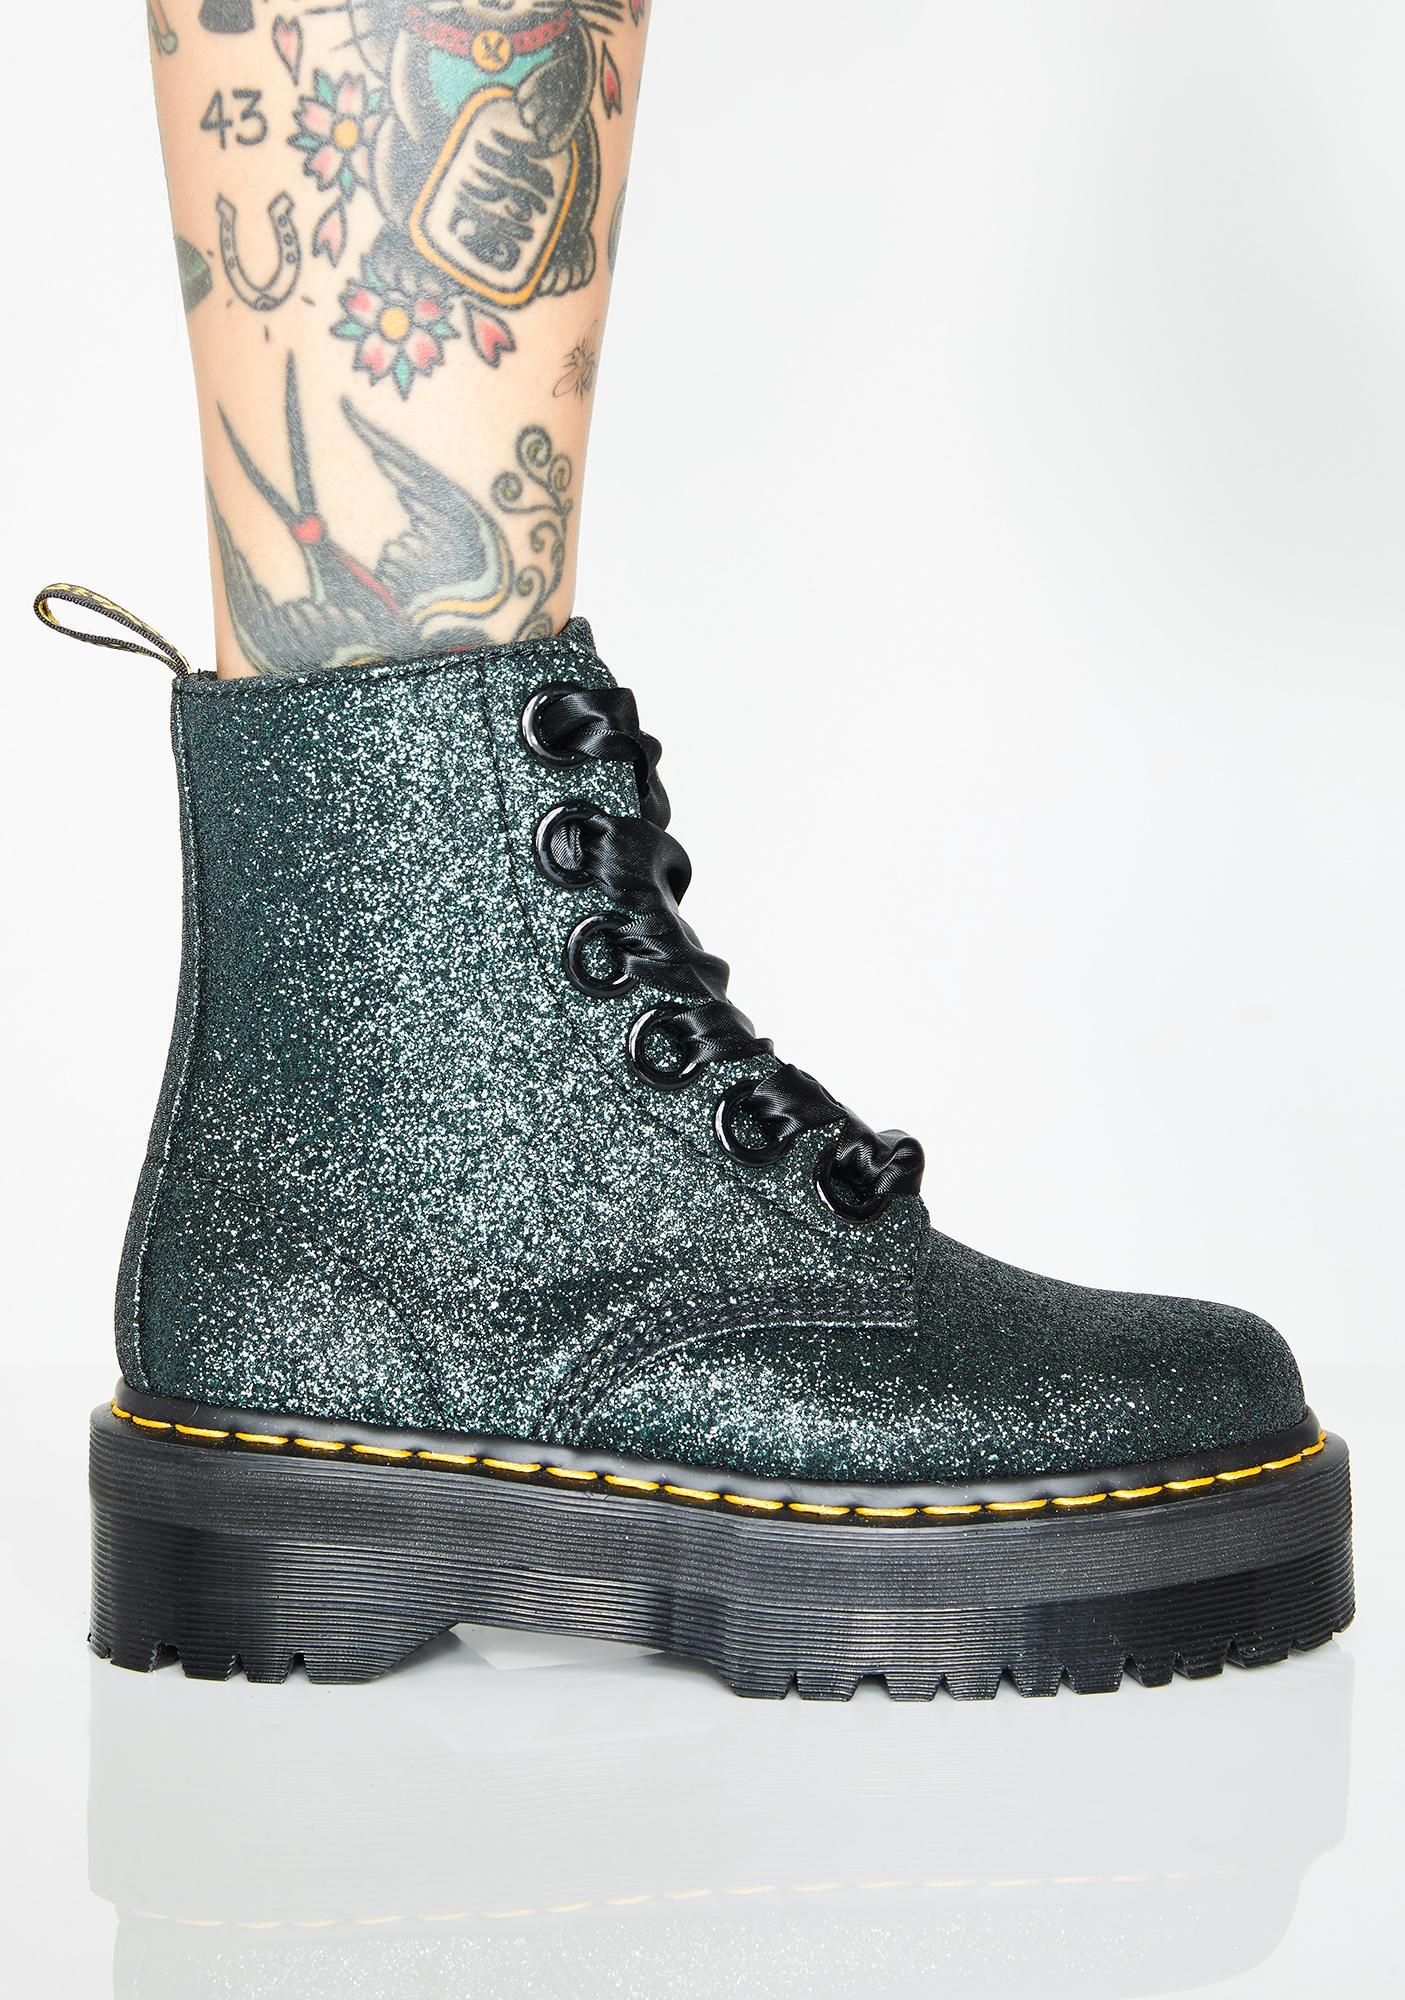 af02dab6a Dr. Martens Emerald Molly Glitter Boots | Dolls Kill